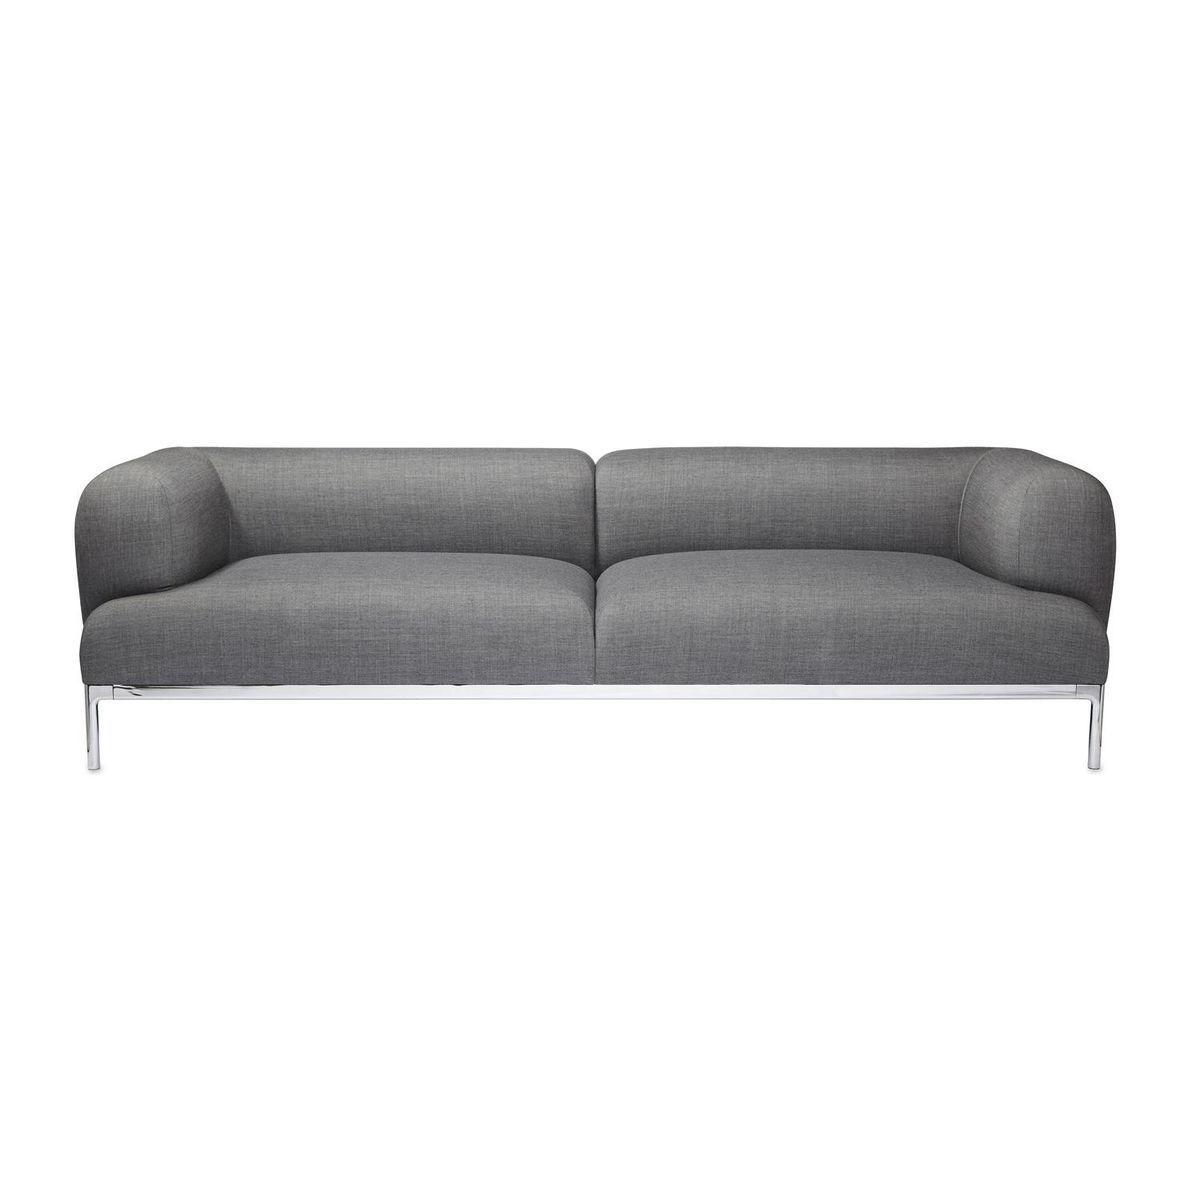 Sofa modern grau  Bjørn 3 Seater Sofa | HAY | AmbienteDirect.com